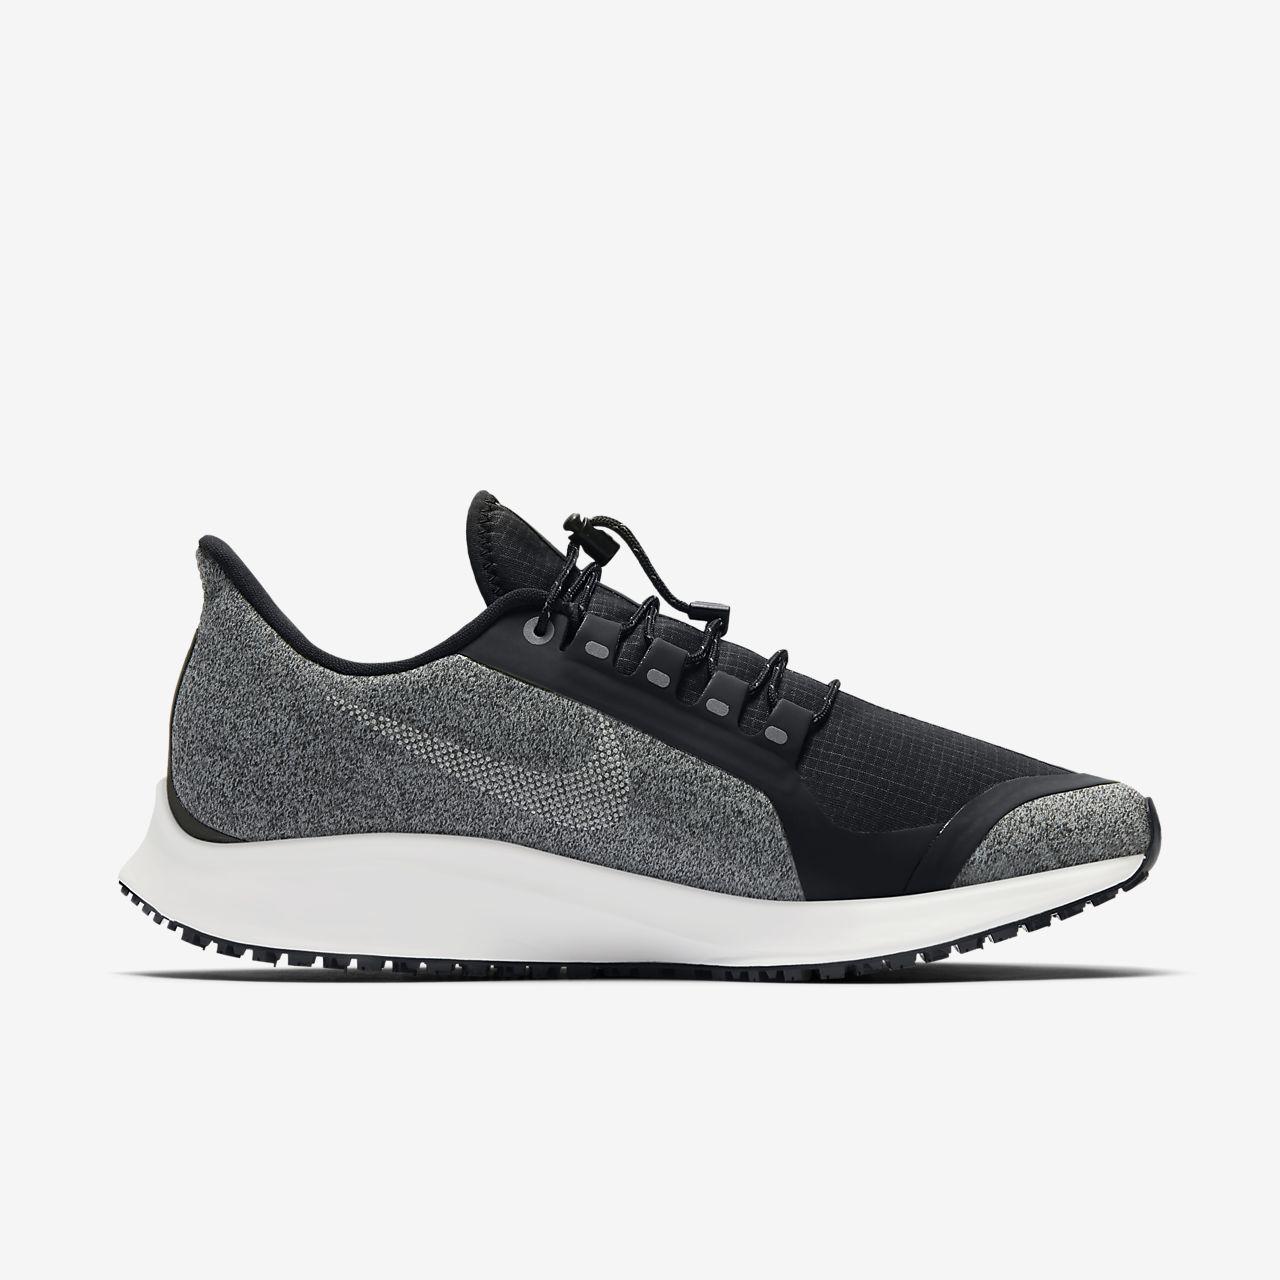 Chaussure de running Nike Air Zoom Pegasus 35 Shield Water Repellent pour Femme